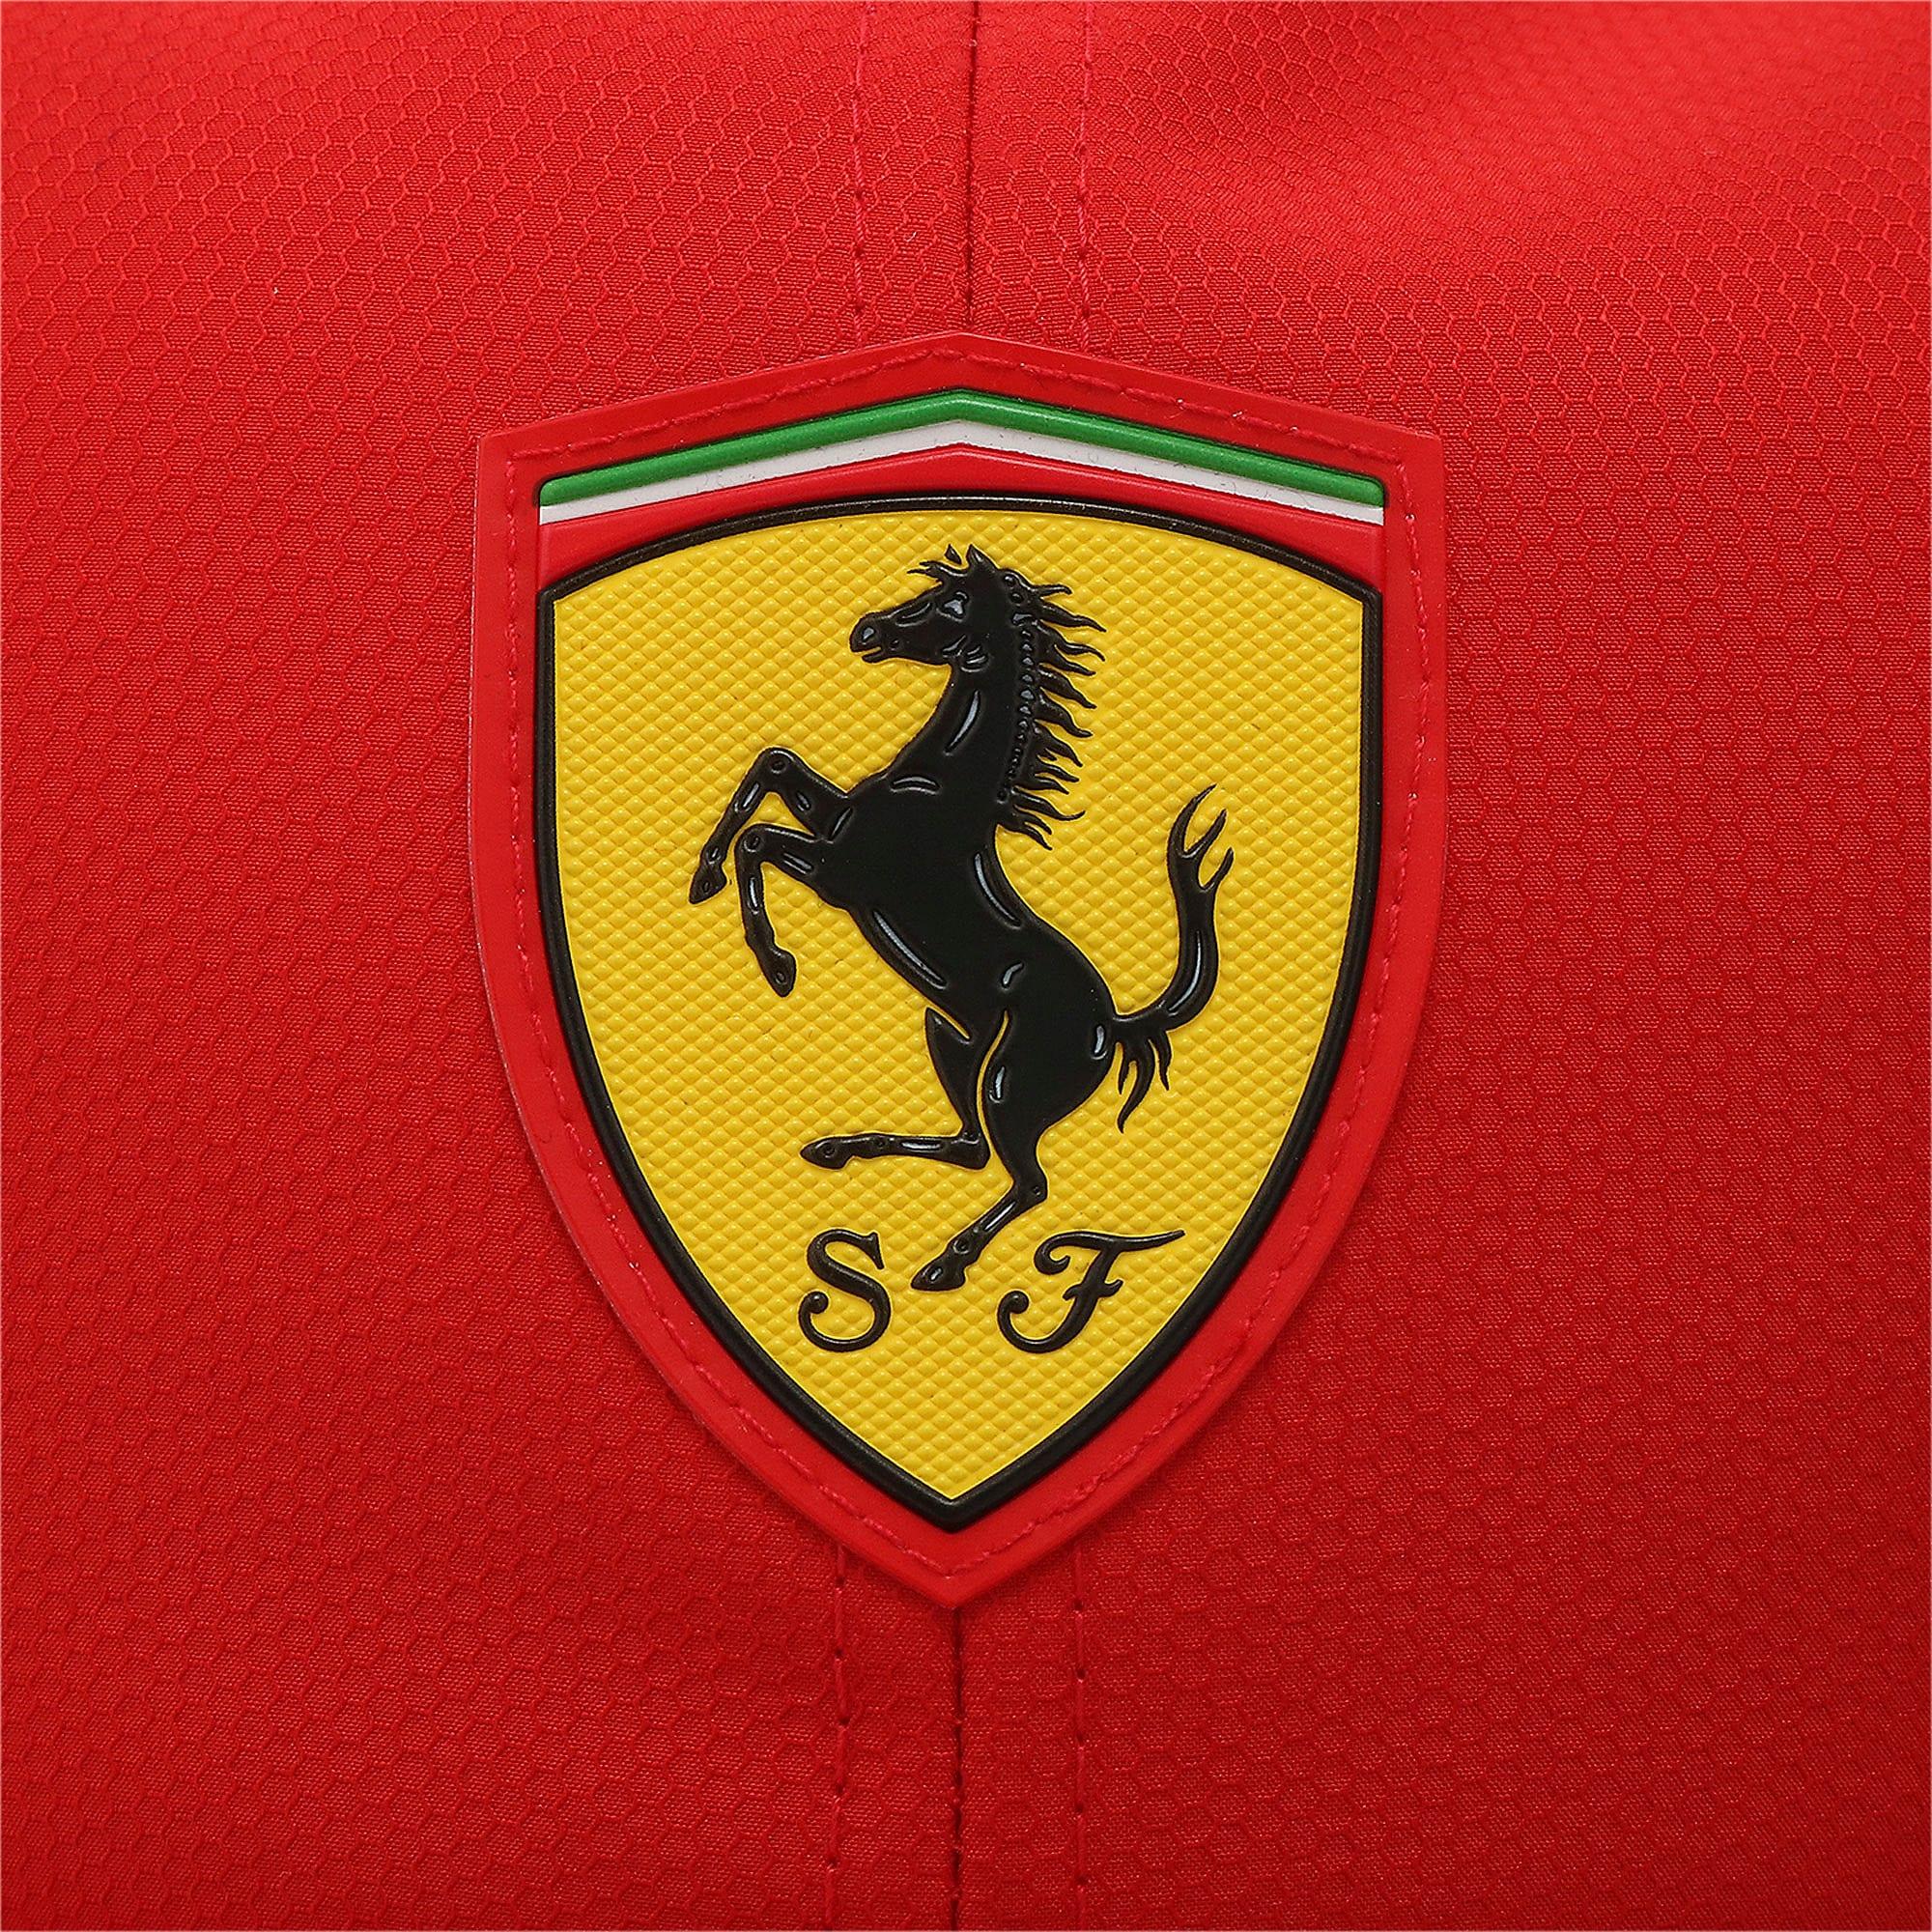 Thumbnail 5 of フェラーリ ファンウェア トラッカー キャップ, Rosso Corsa, medium-JPN